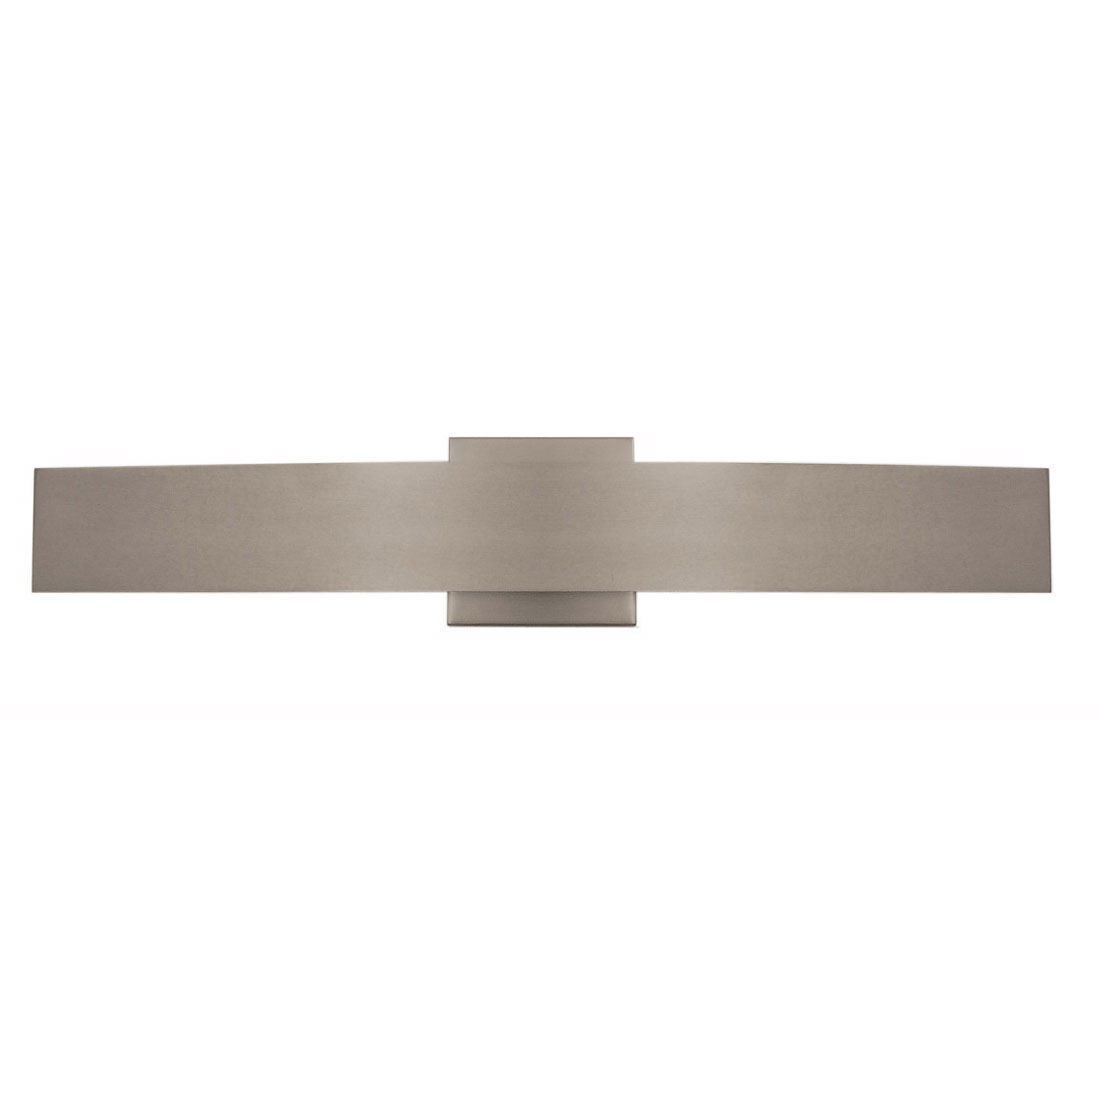 regal halogen wall sconce by edge lighting regal h1 ch. Black Bedroom Furniture Sets. Home Design Ideas